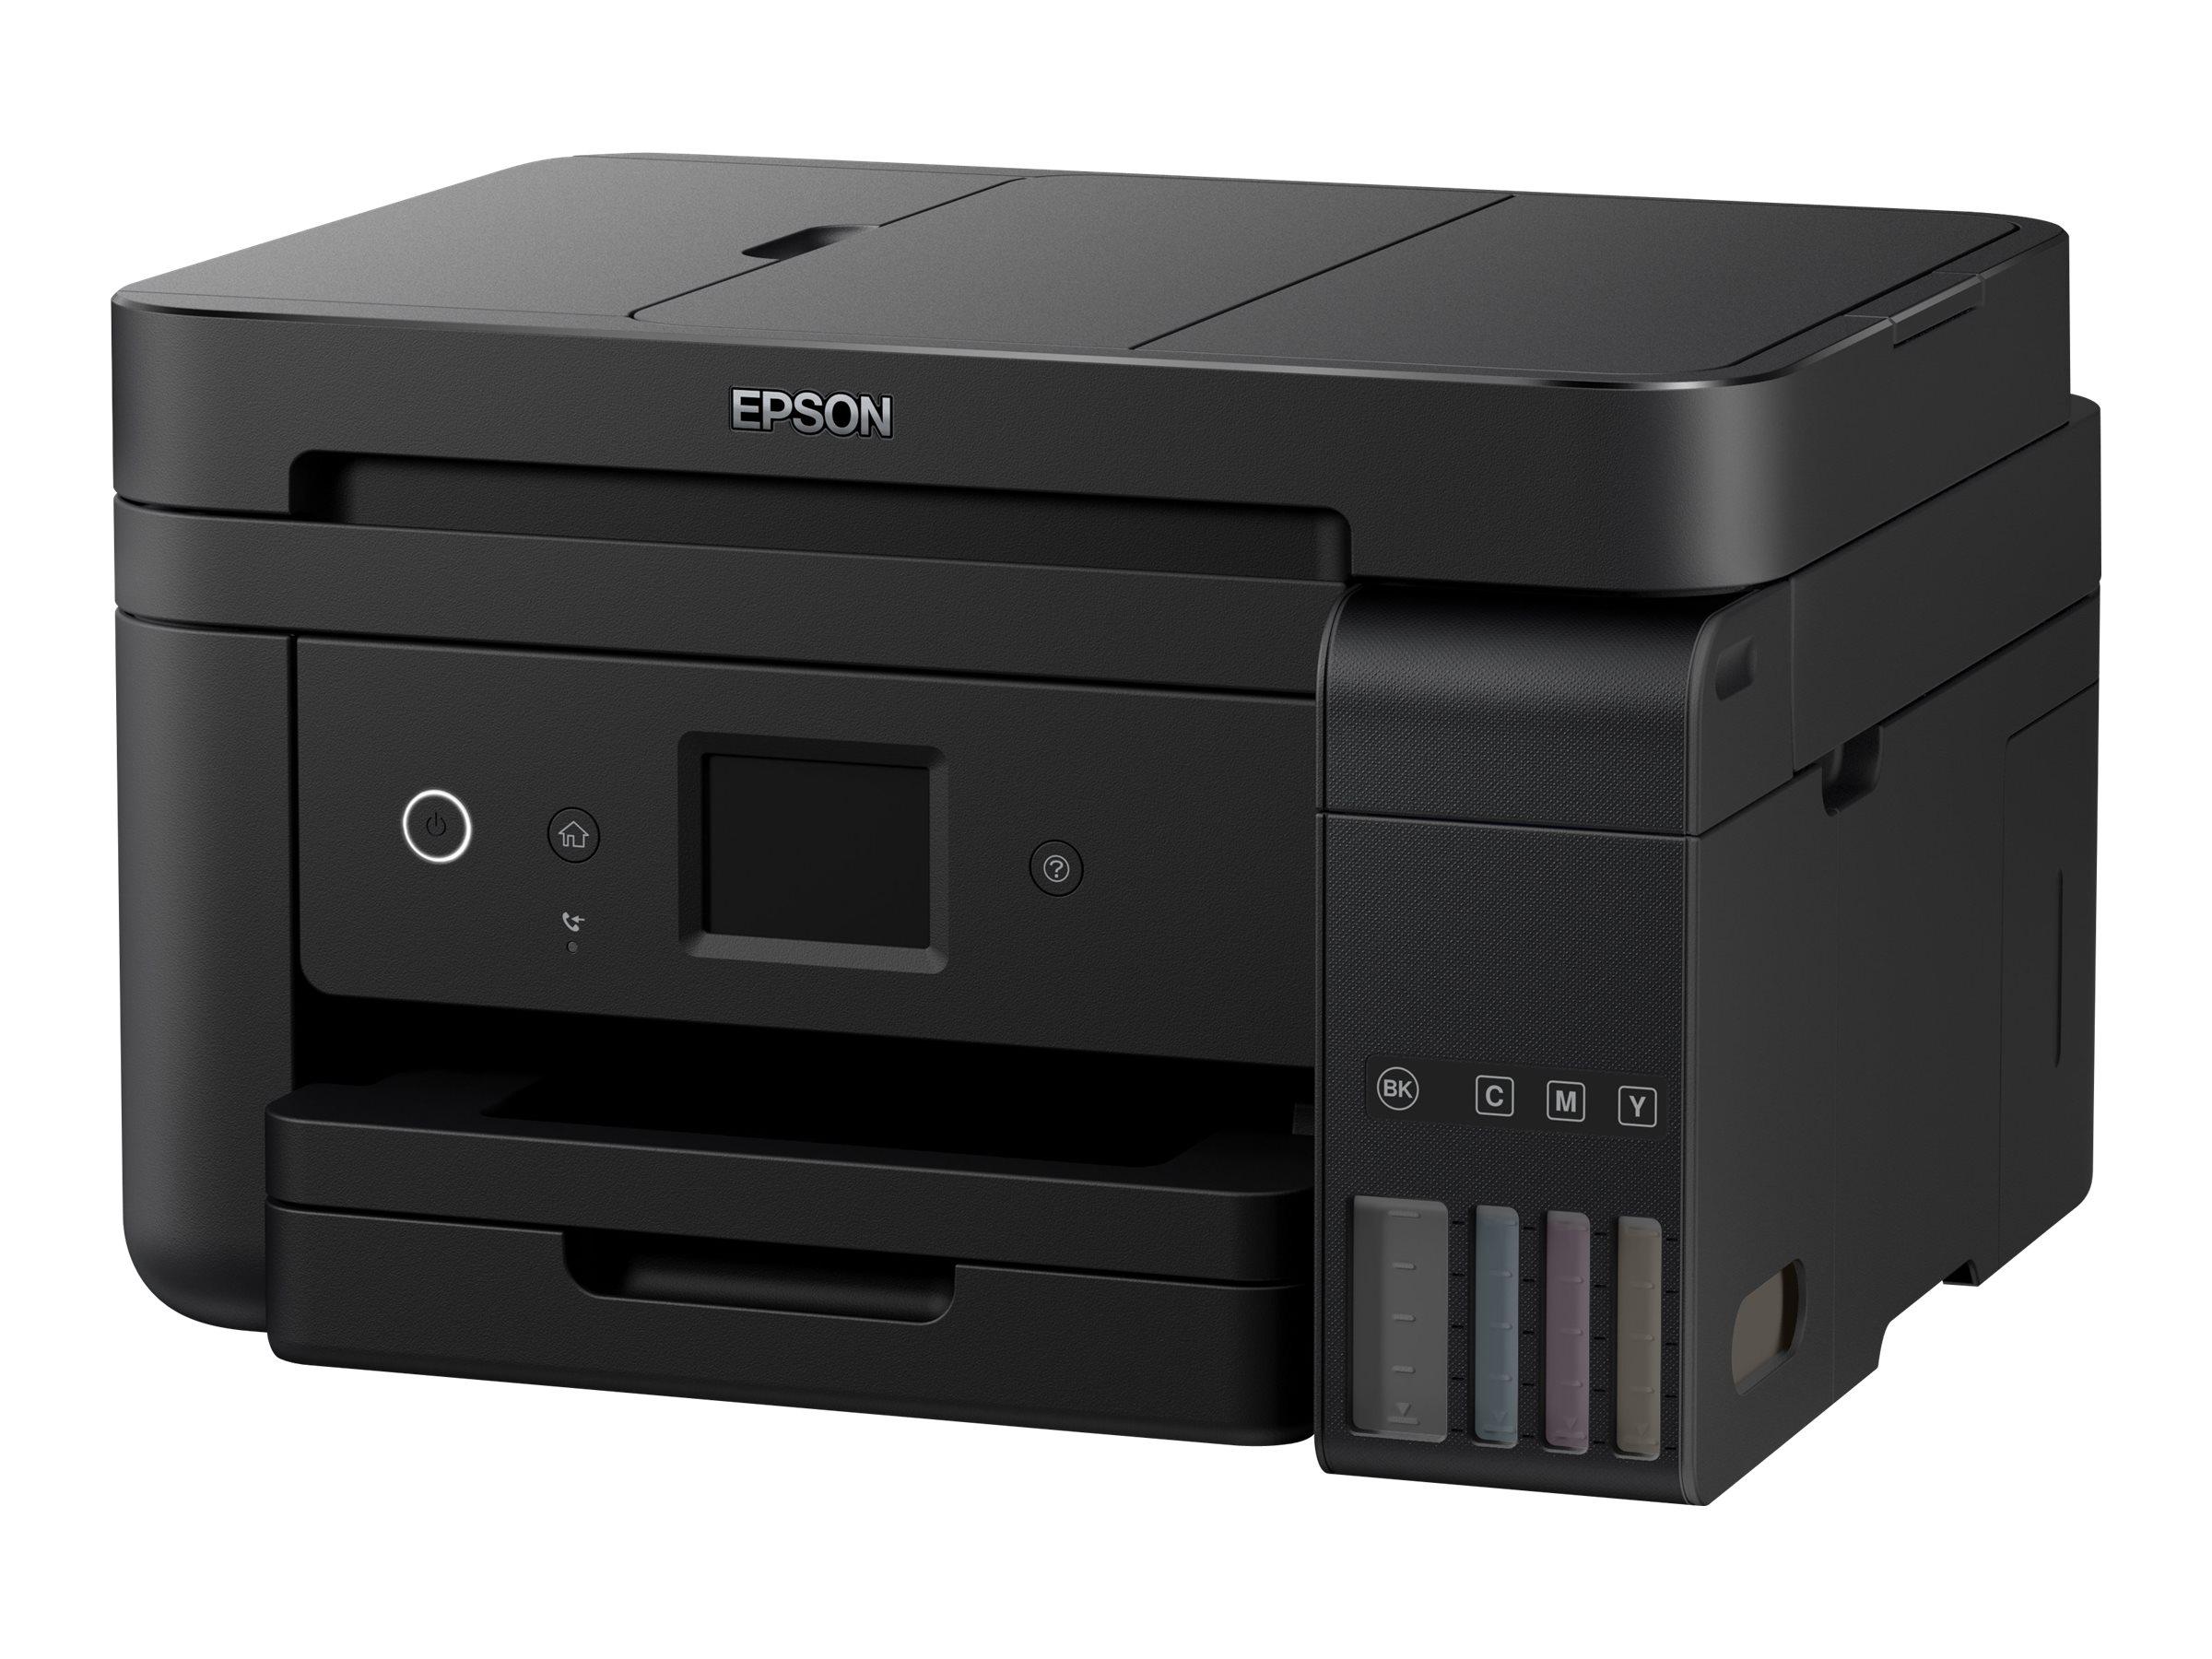 Epson EcoTank ET-4750 - Multifunktionsdrucker - Farbe - Tintenstrahl - A4/Legal (Medien)